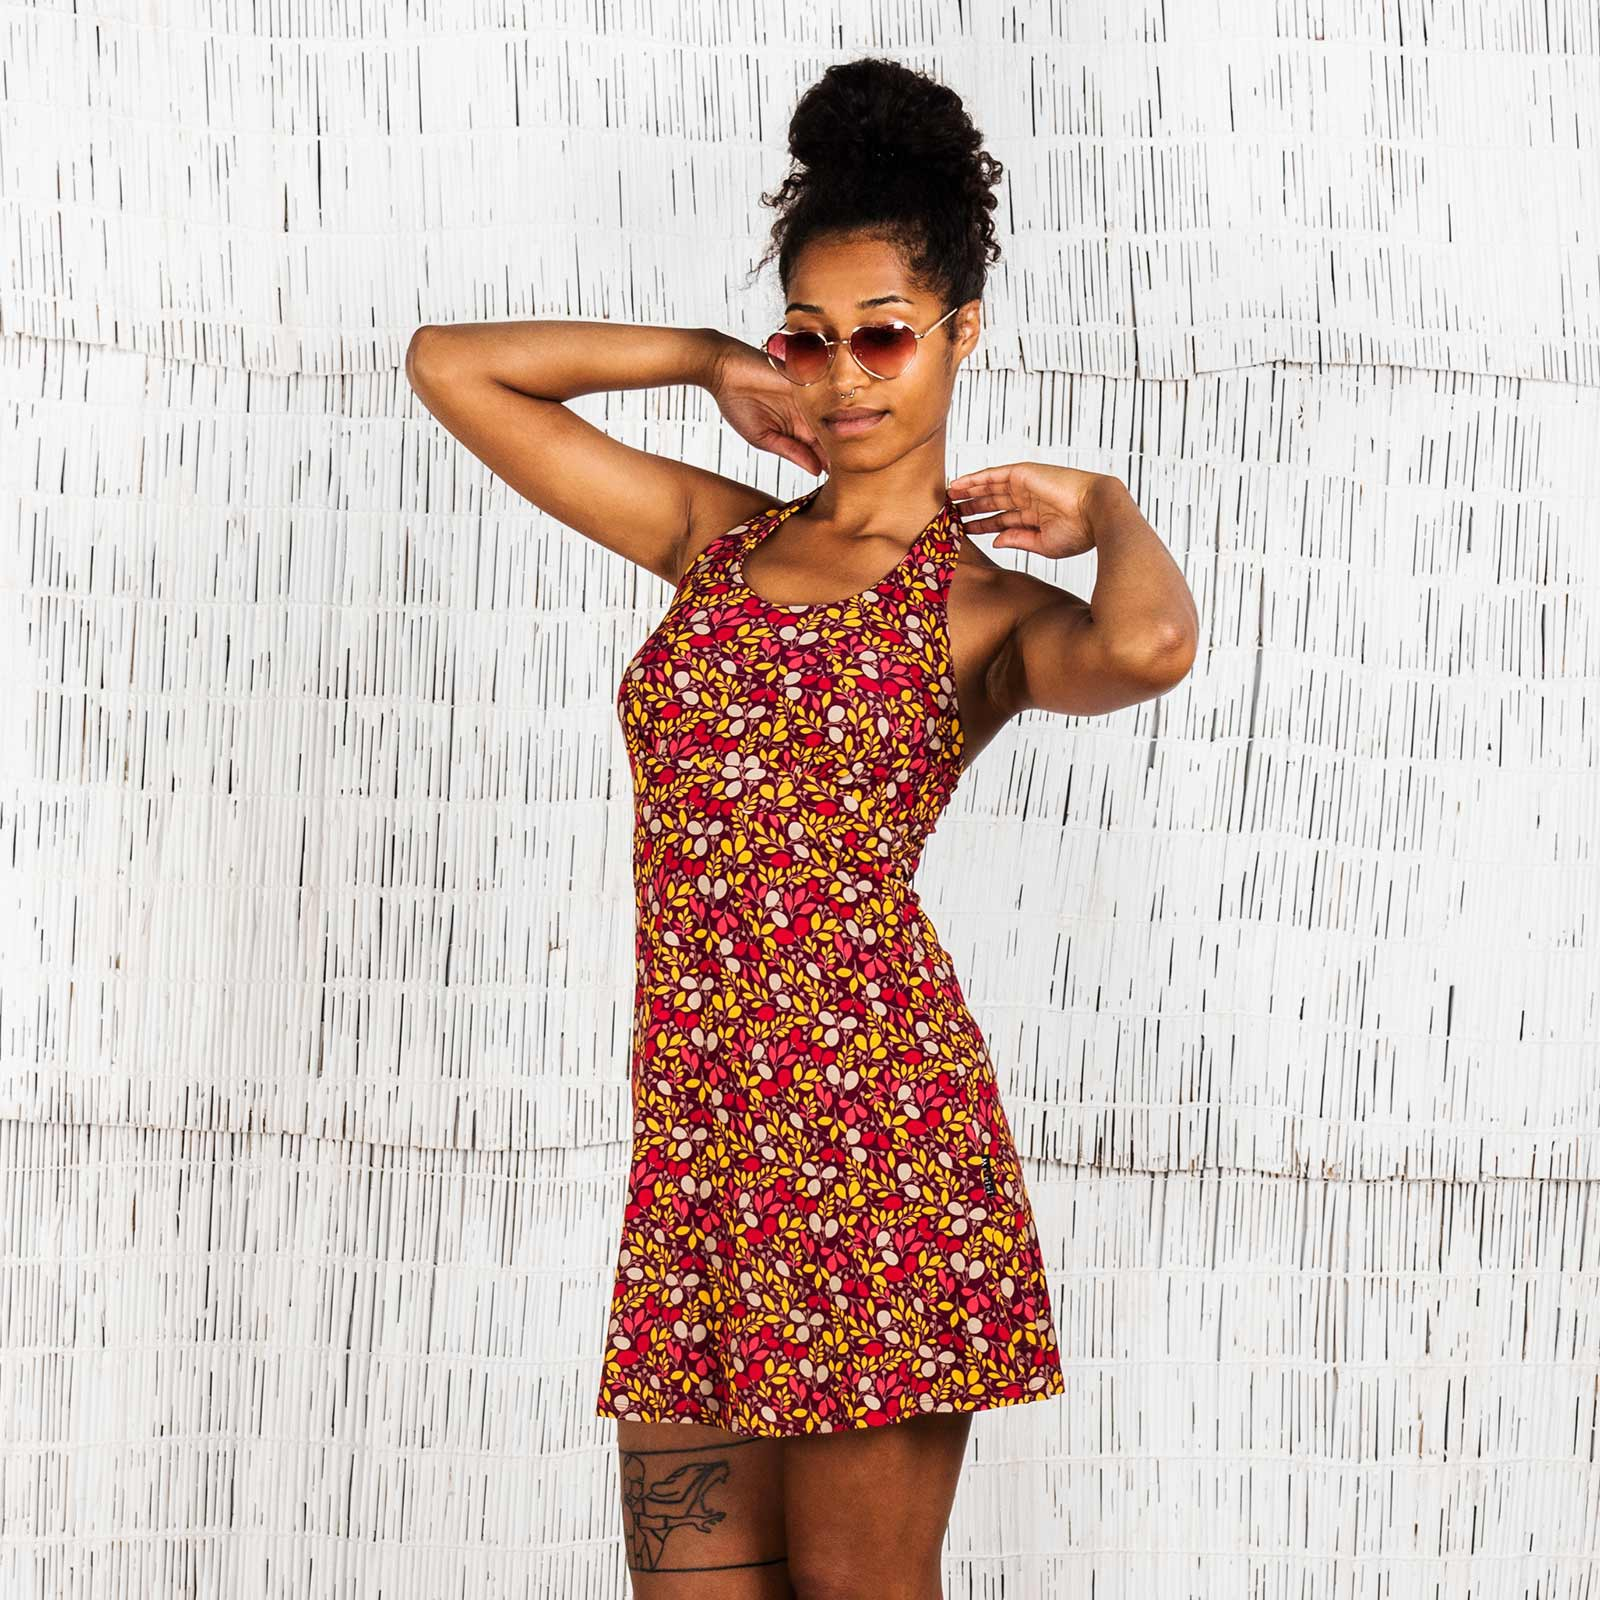 Moshiki short halter dress, red